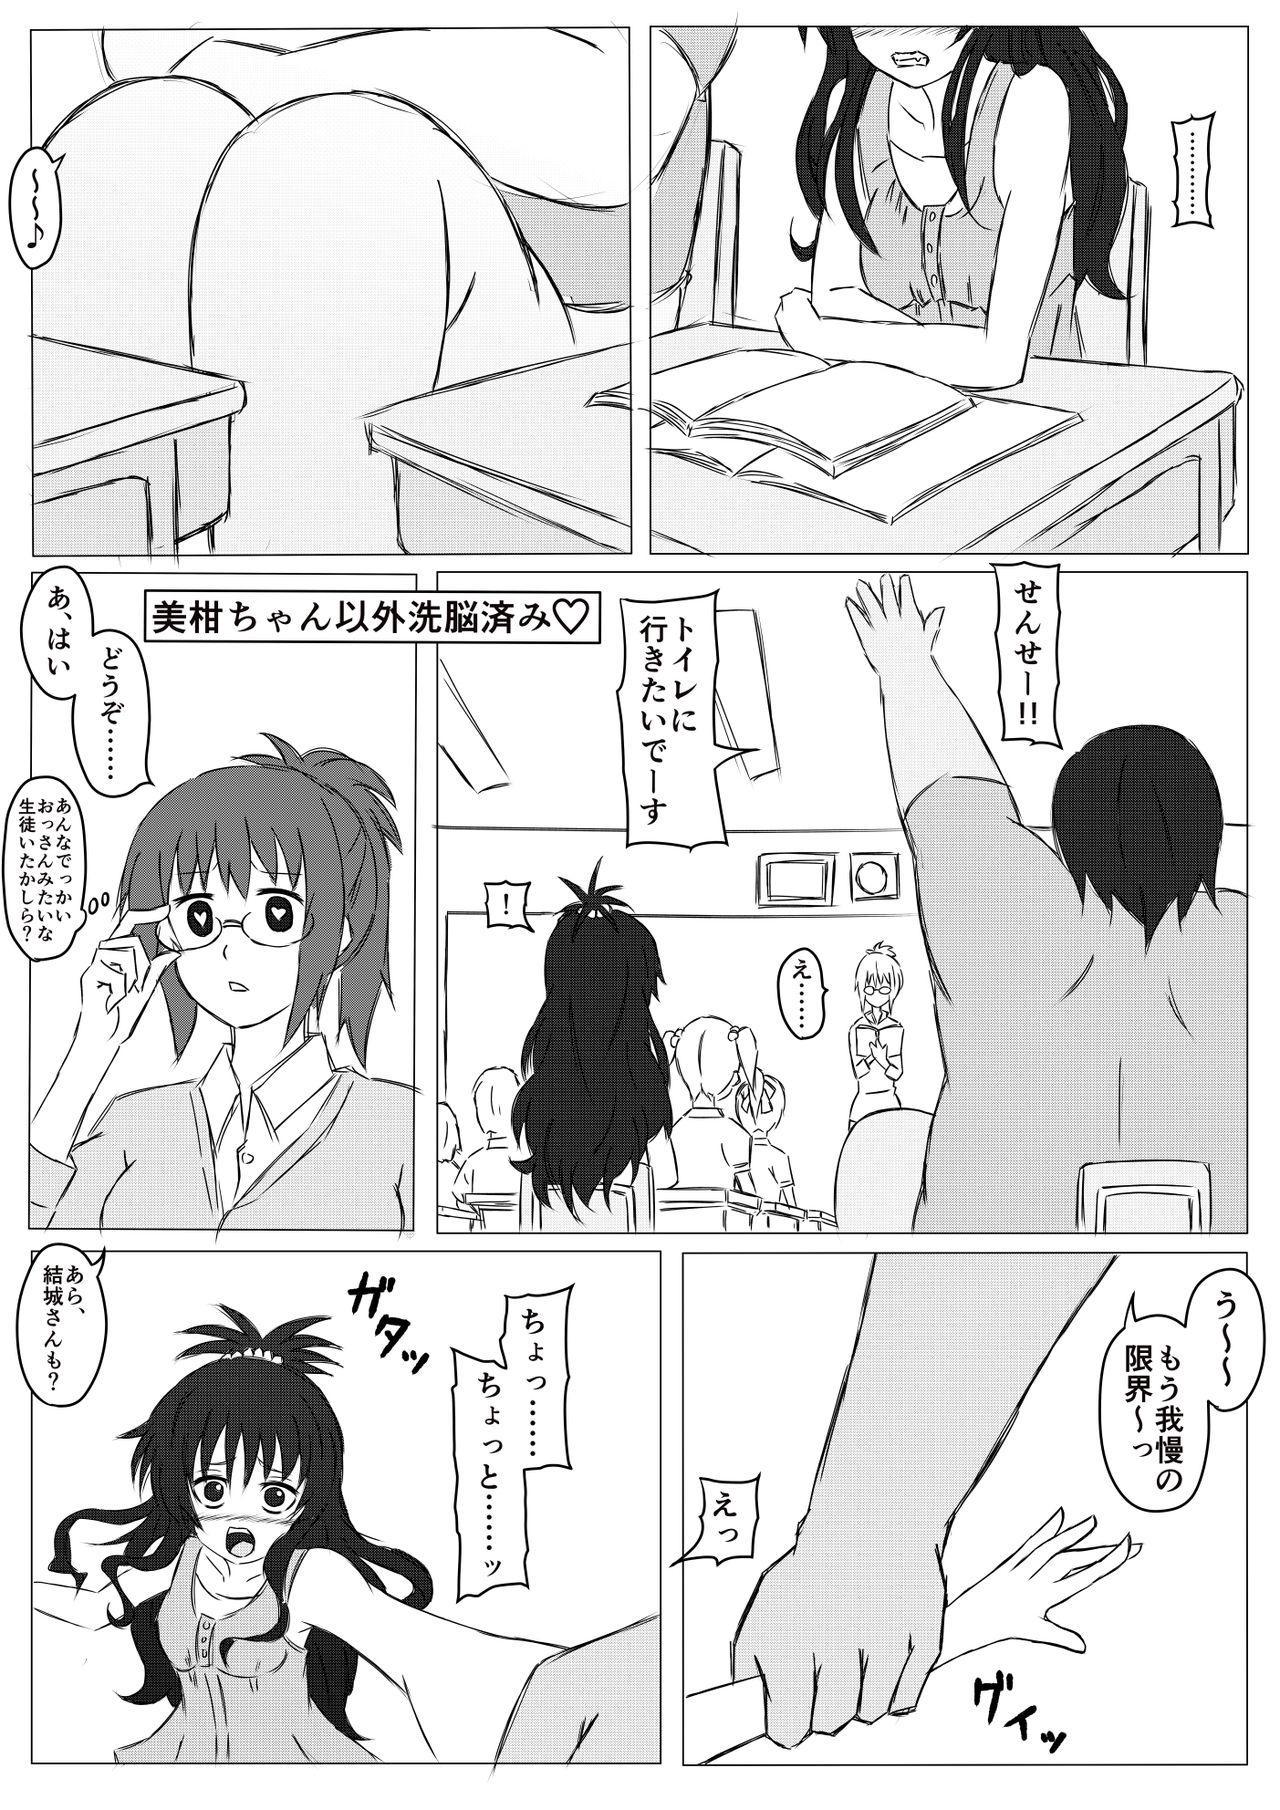 Mikan-chan Igai Sennouzumi 0